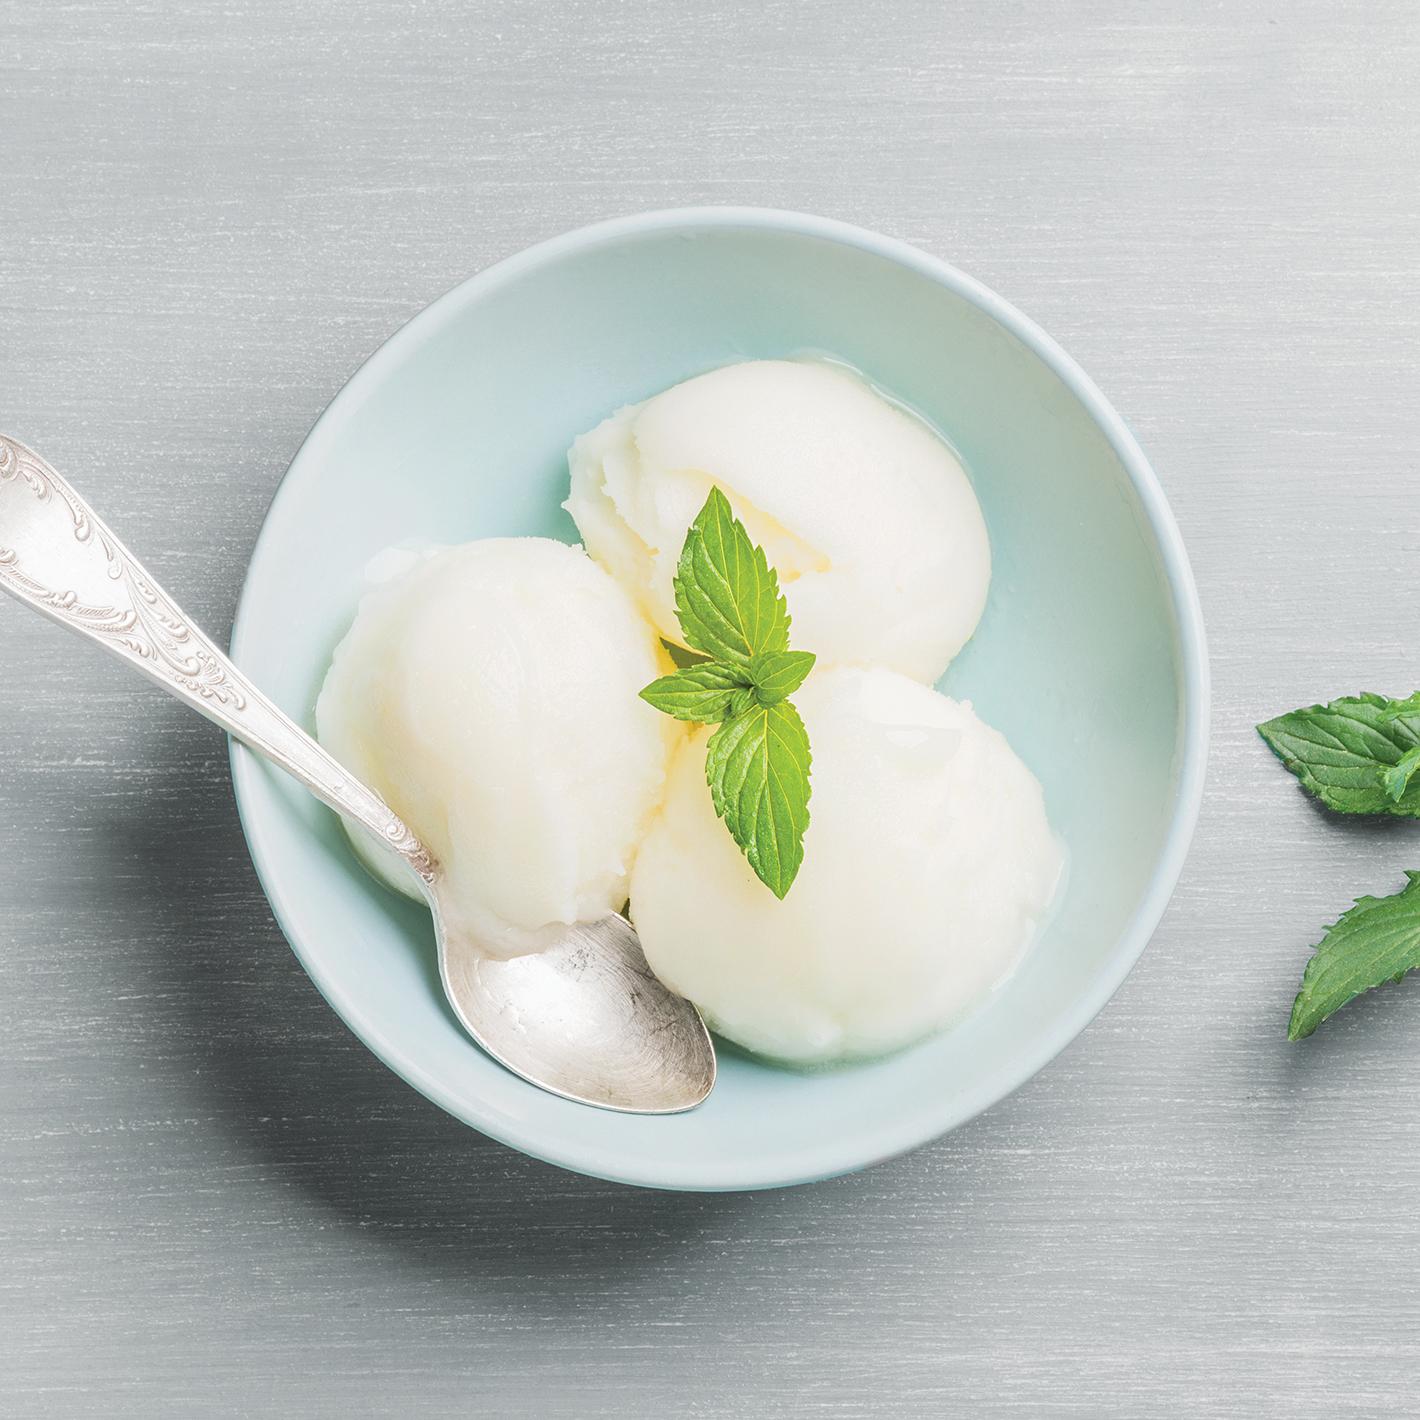 lemon-sorbet-ice-cream-with-mint-PBMSR8F edit.jpg